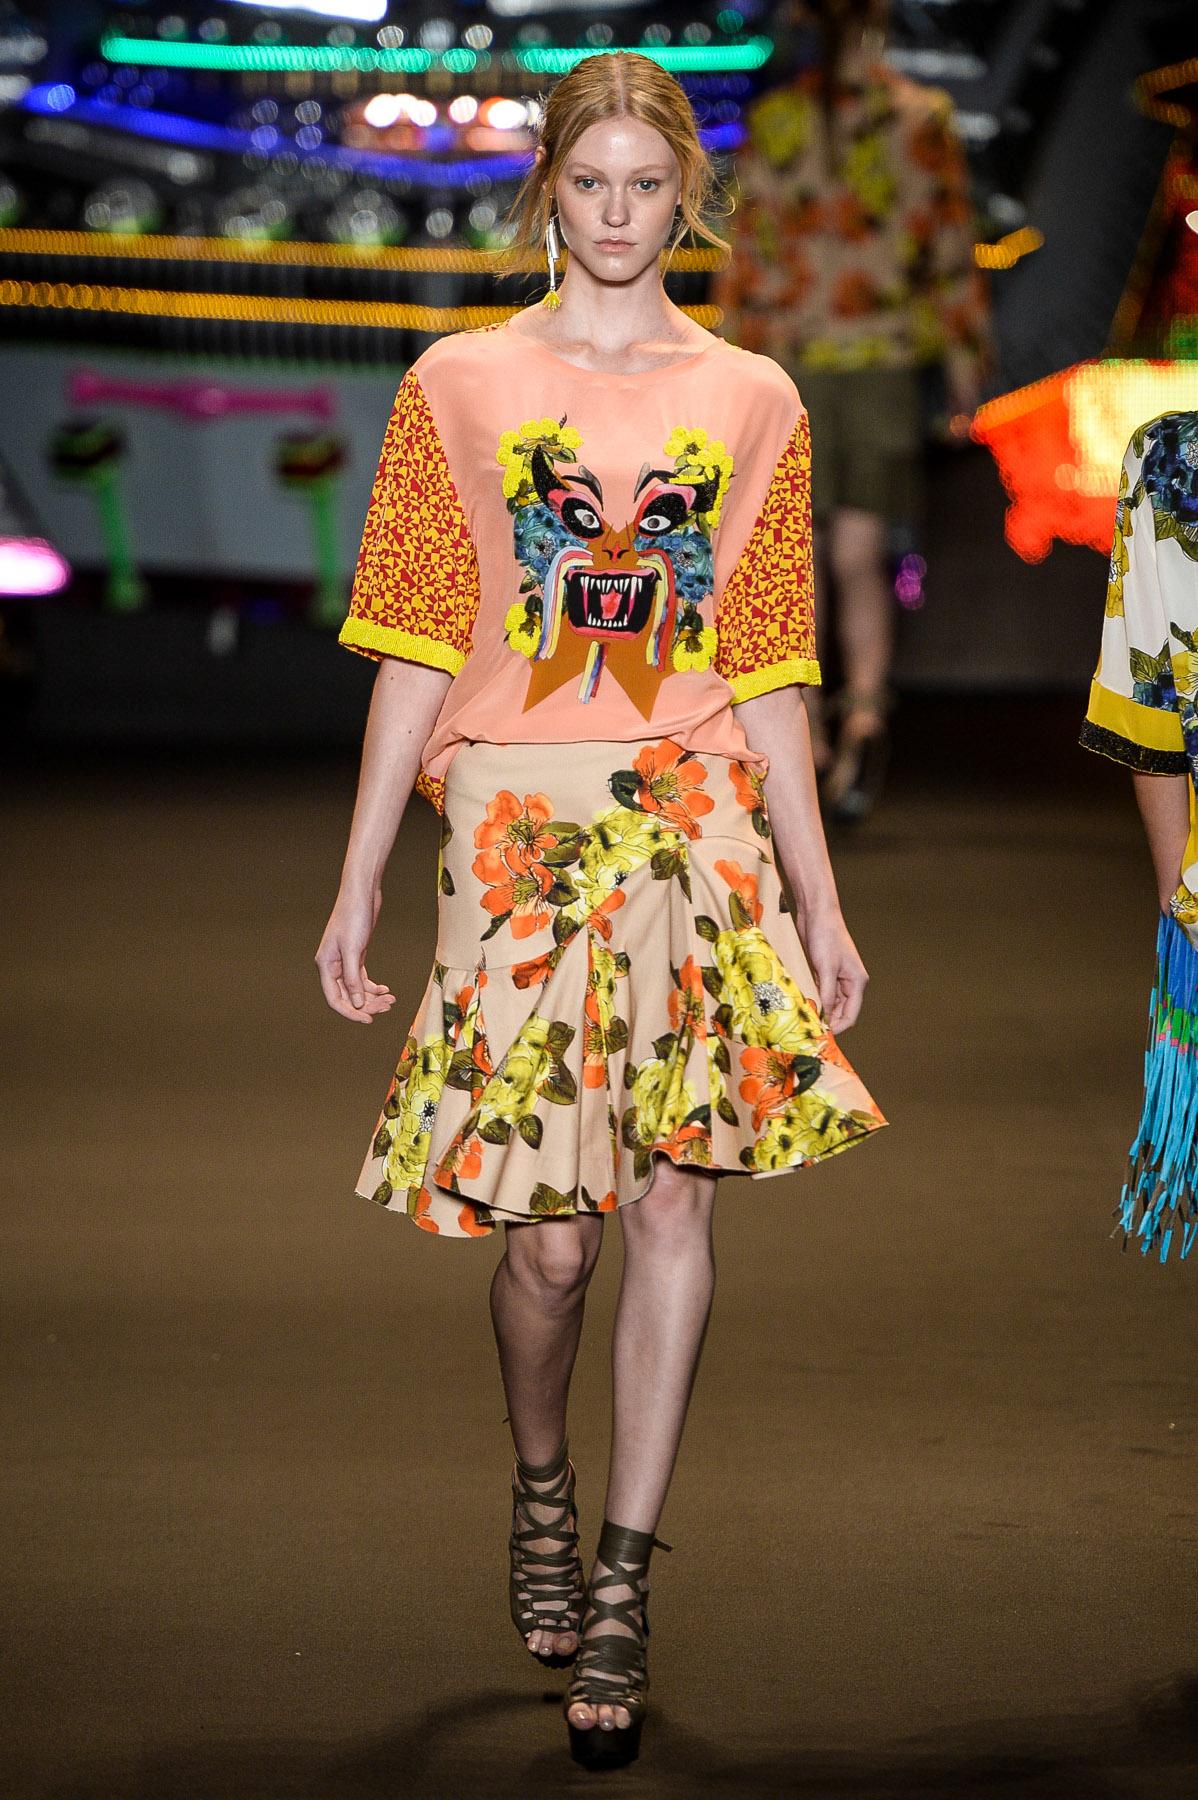 Cole O Espa O Fashion Fashion Rio Ver O 2015 Rtw Foto 7 Desfiles Ffw